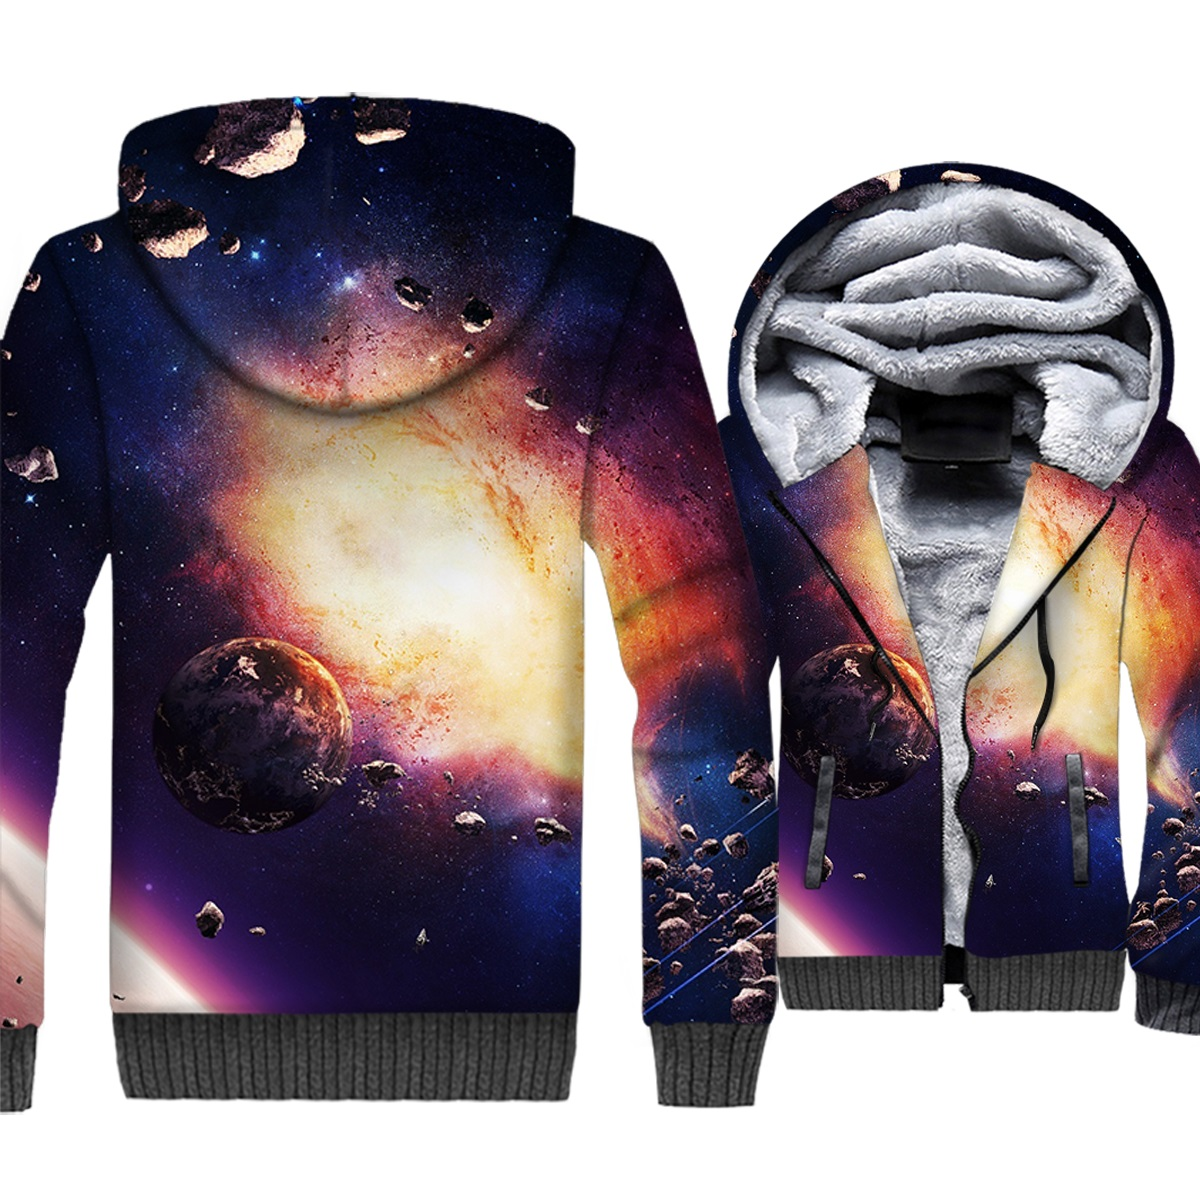 Space Galaxy Jackets Men 3D Planet Hoodie Men Colorful Sweatshirt Winter Thick Fleece Paisley Stars Nebula Coat Brand Clothing